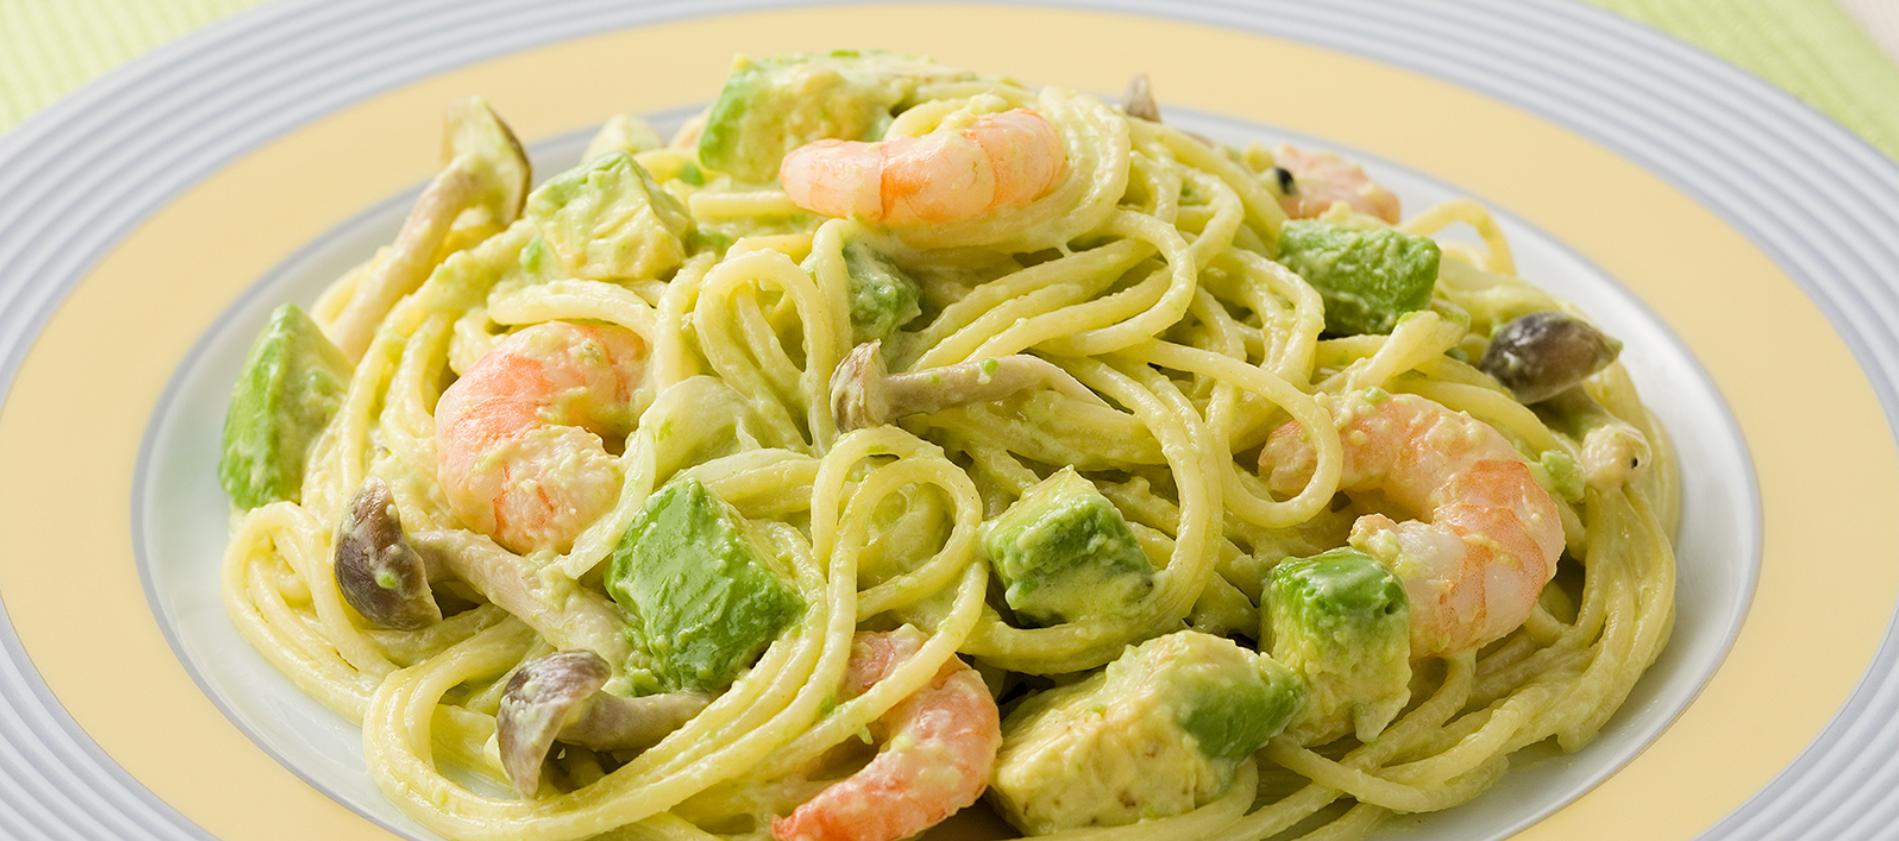 Creamy Wasabi Avocado Spaghetti